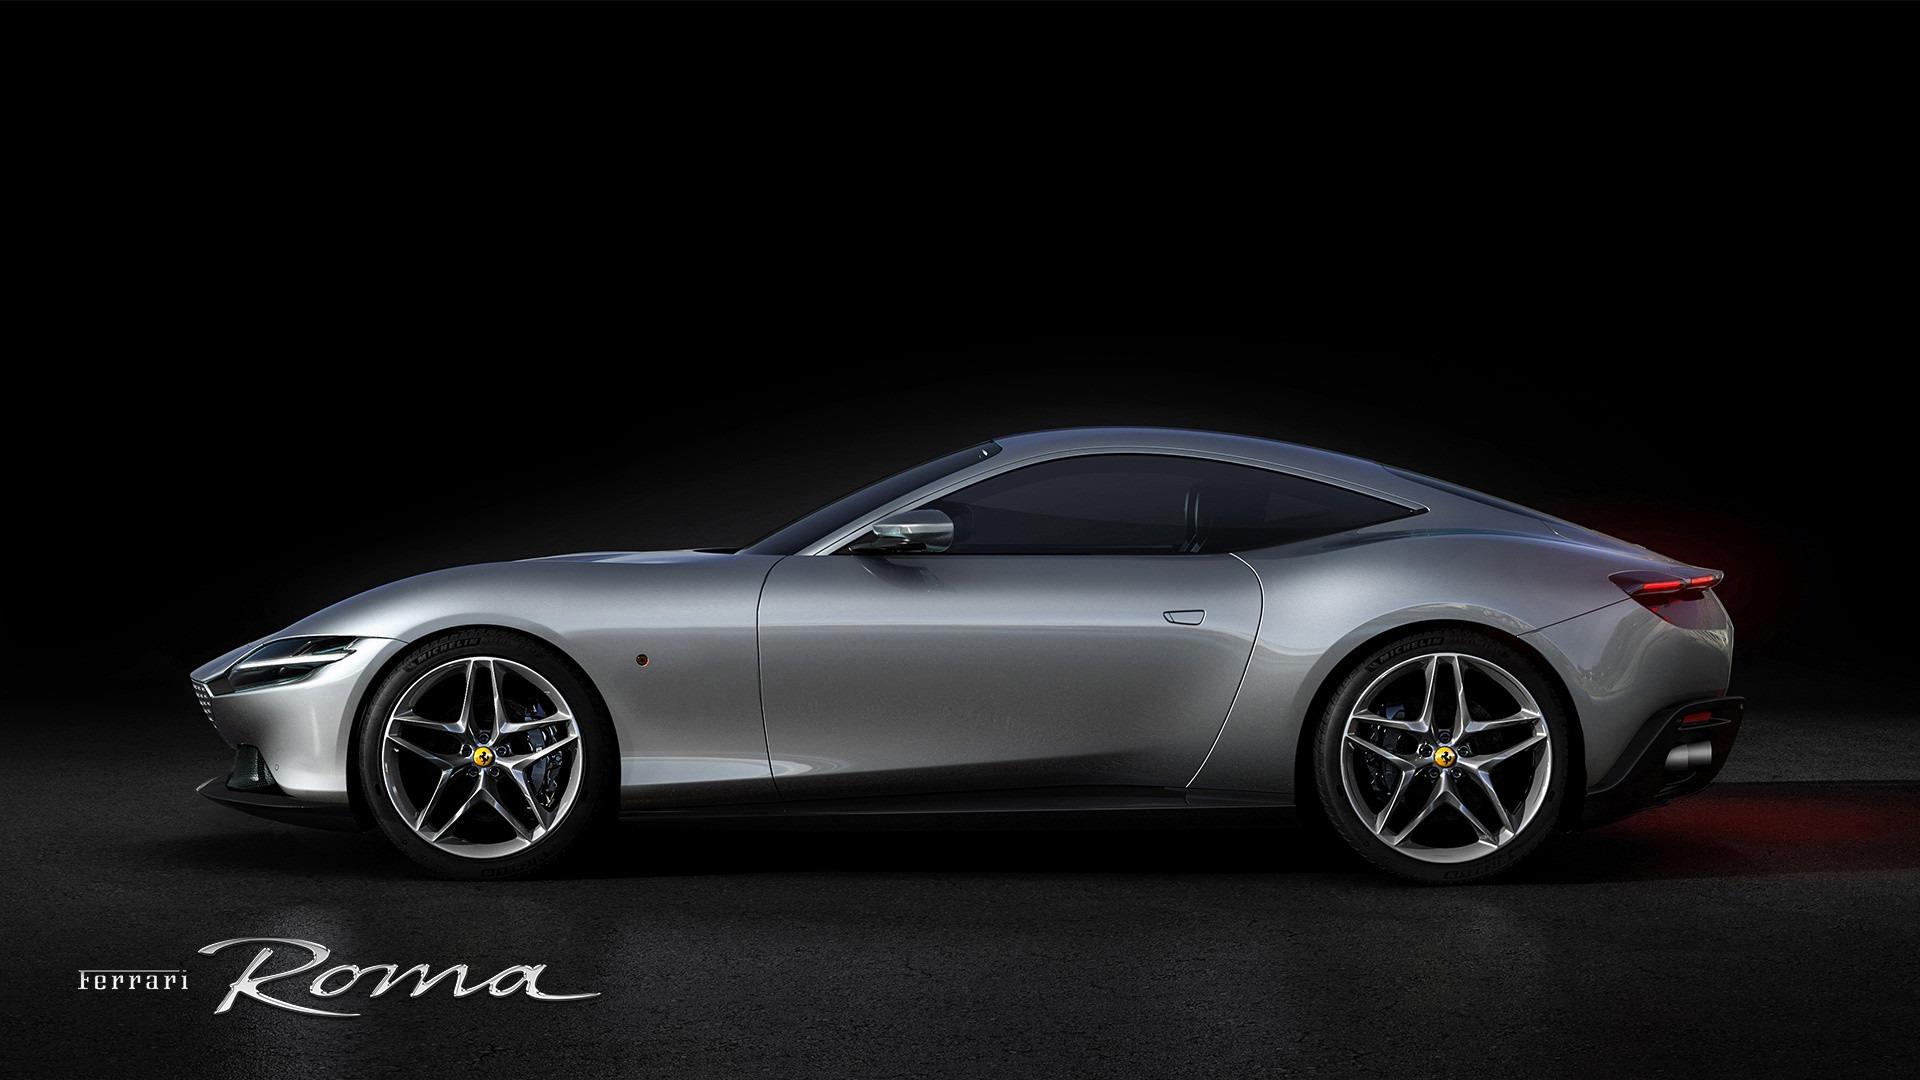 New 2021 Ferrari Roma